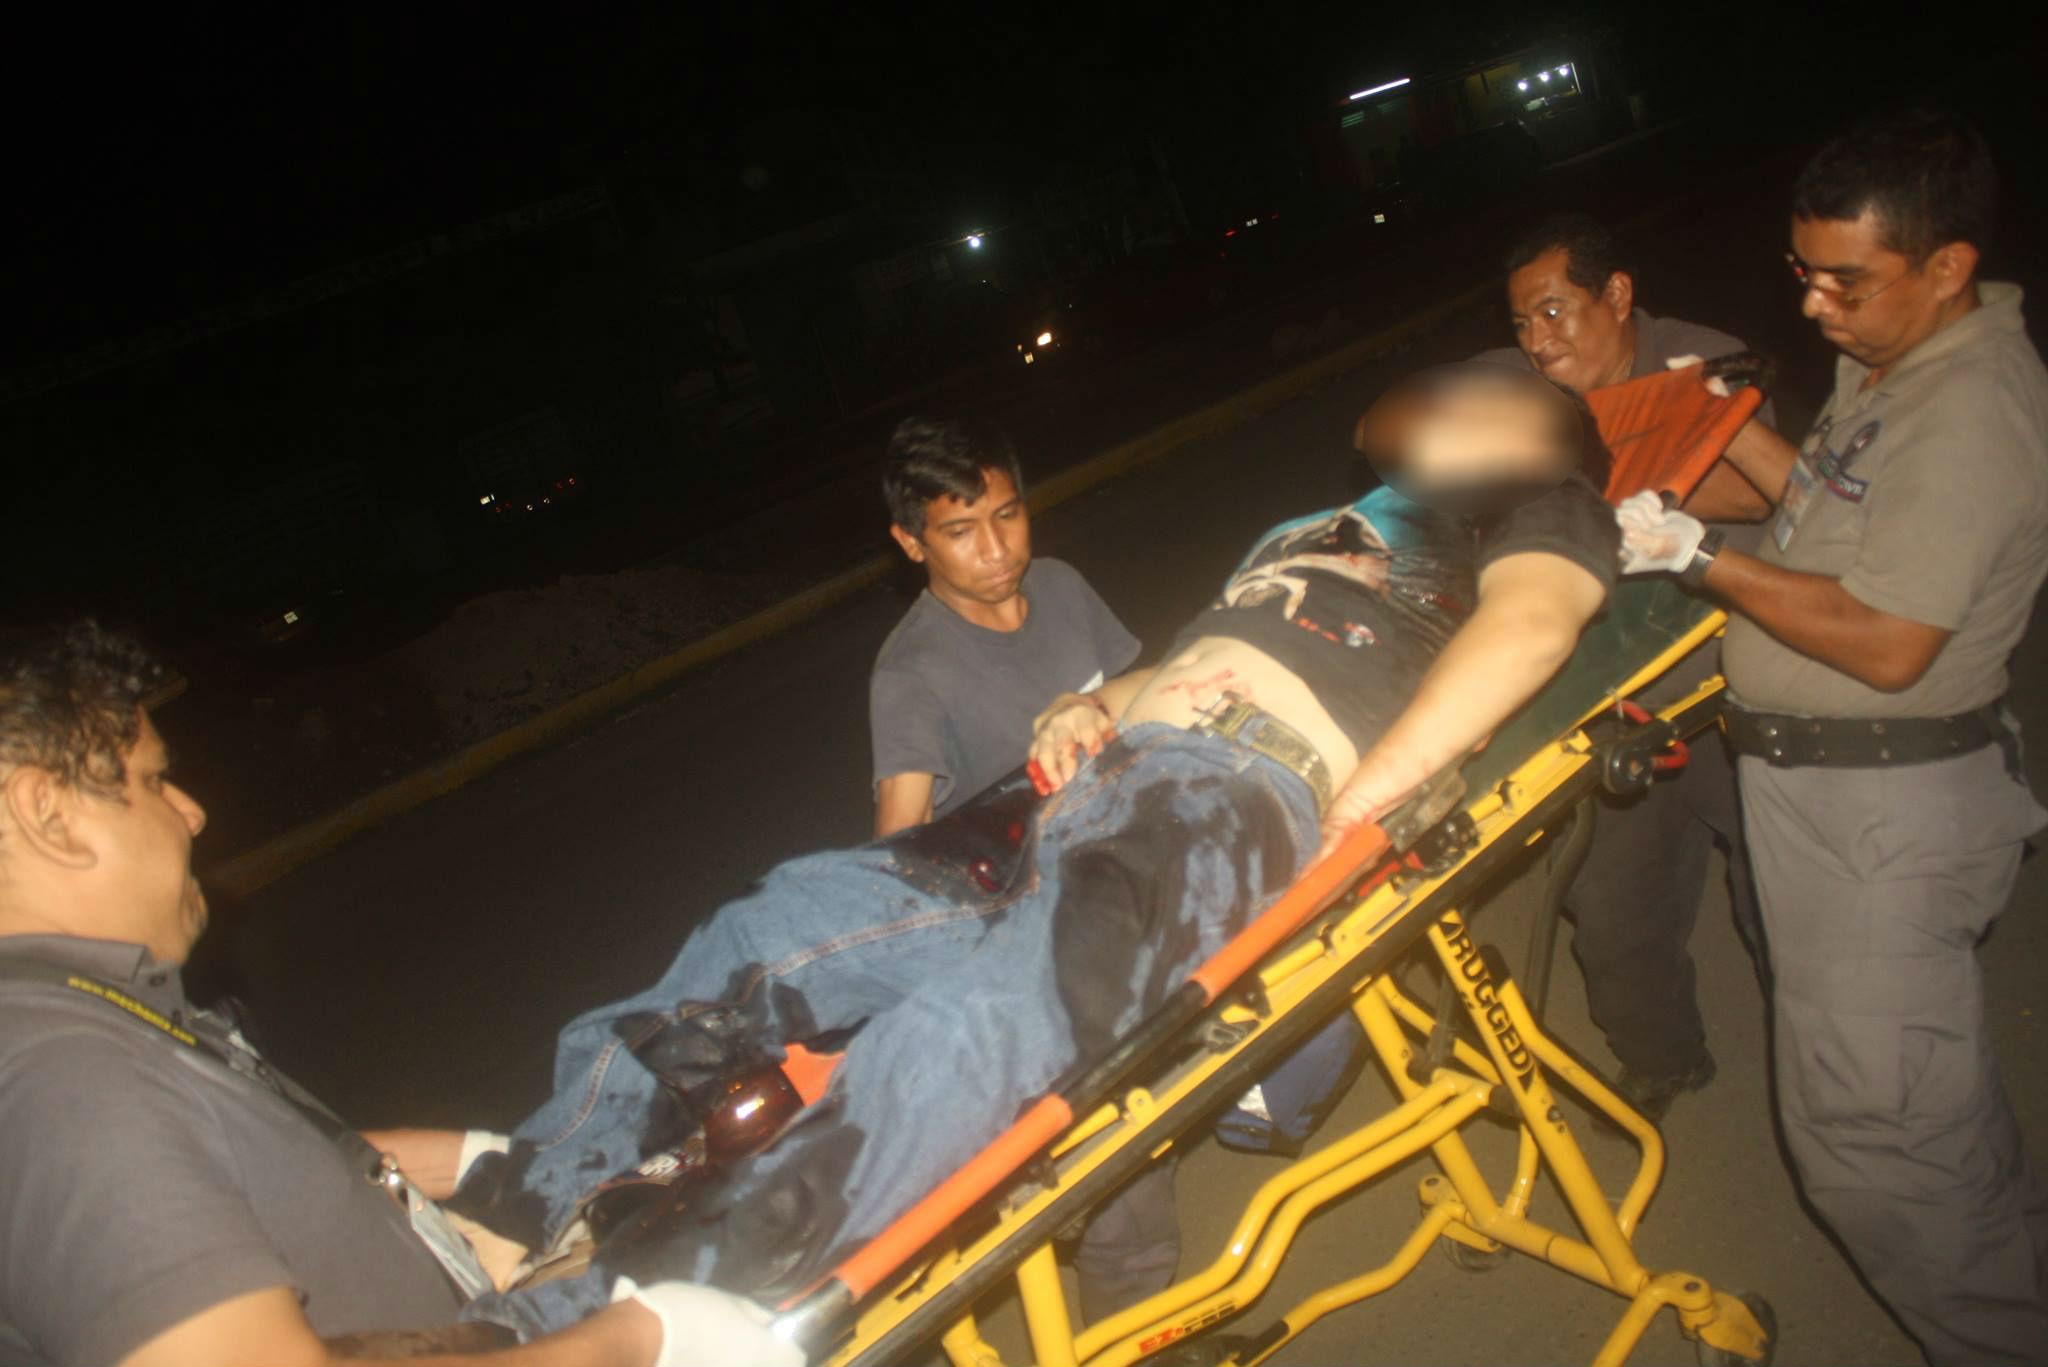 Hieren a balazos a empleado del Hospital Regional, en Apatzingán